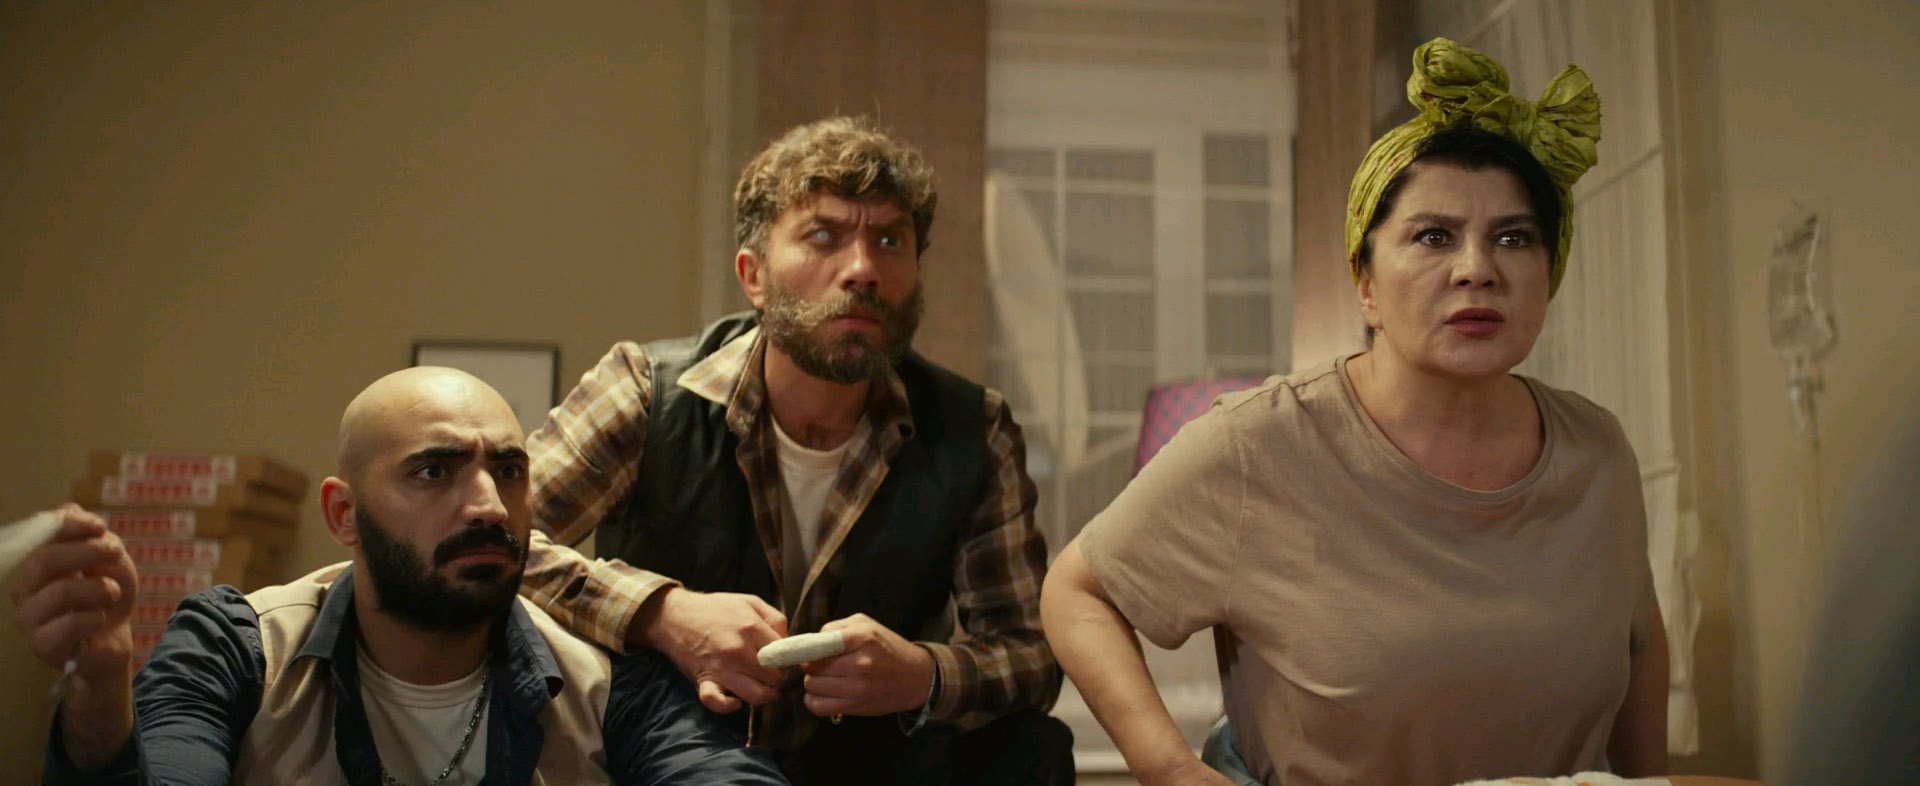 Baba Parası | 2020 | Yerli Film | NF | WEB-DL | XviD | Sansürsüz | 4K - 720p - 1080p - m720p - m1080p | WEB-DL | Tek Link